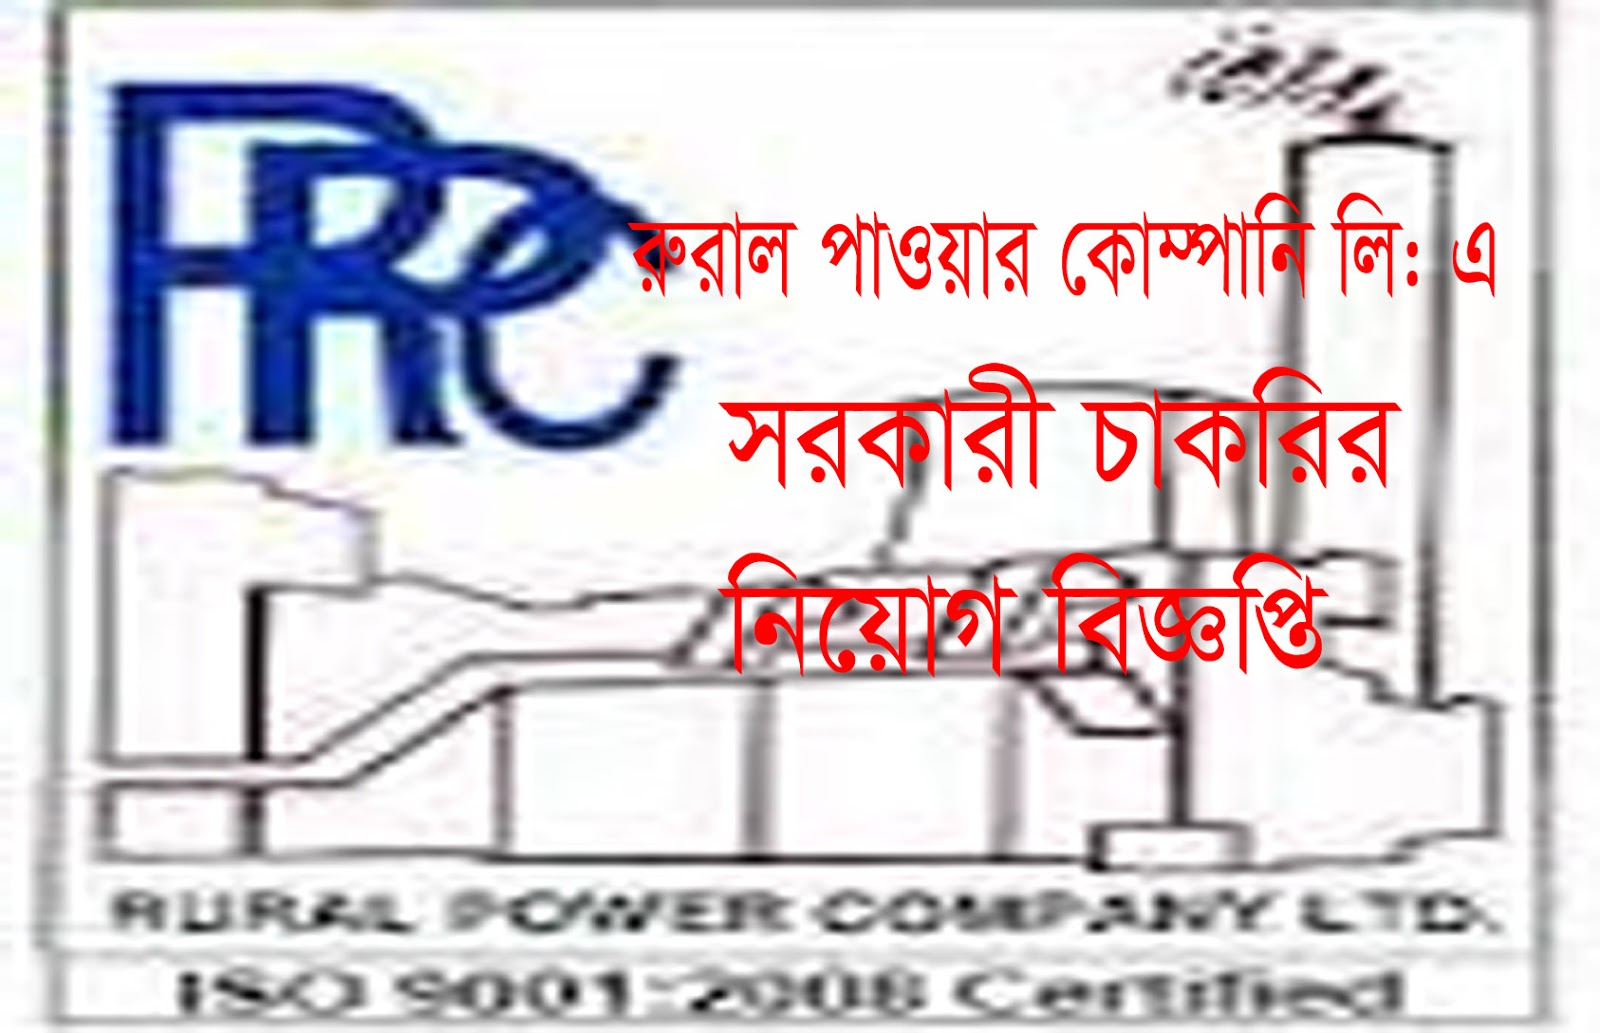 Rural Power Company Limited Job Circular 2020 www.rpcl.gov.bd